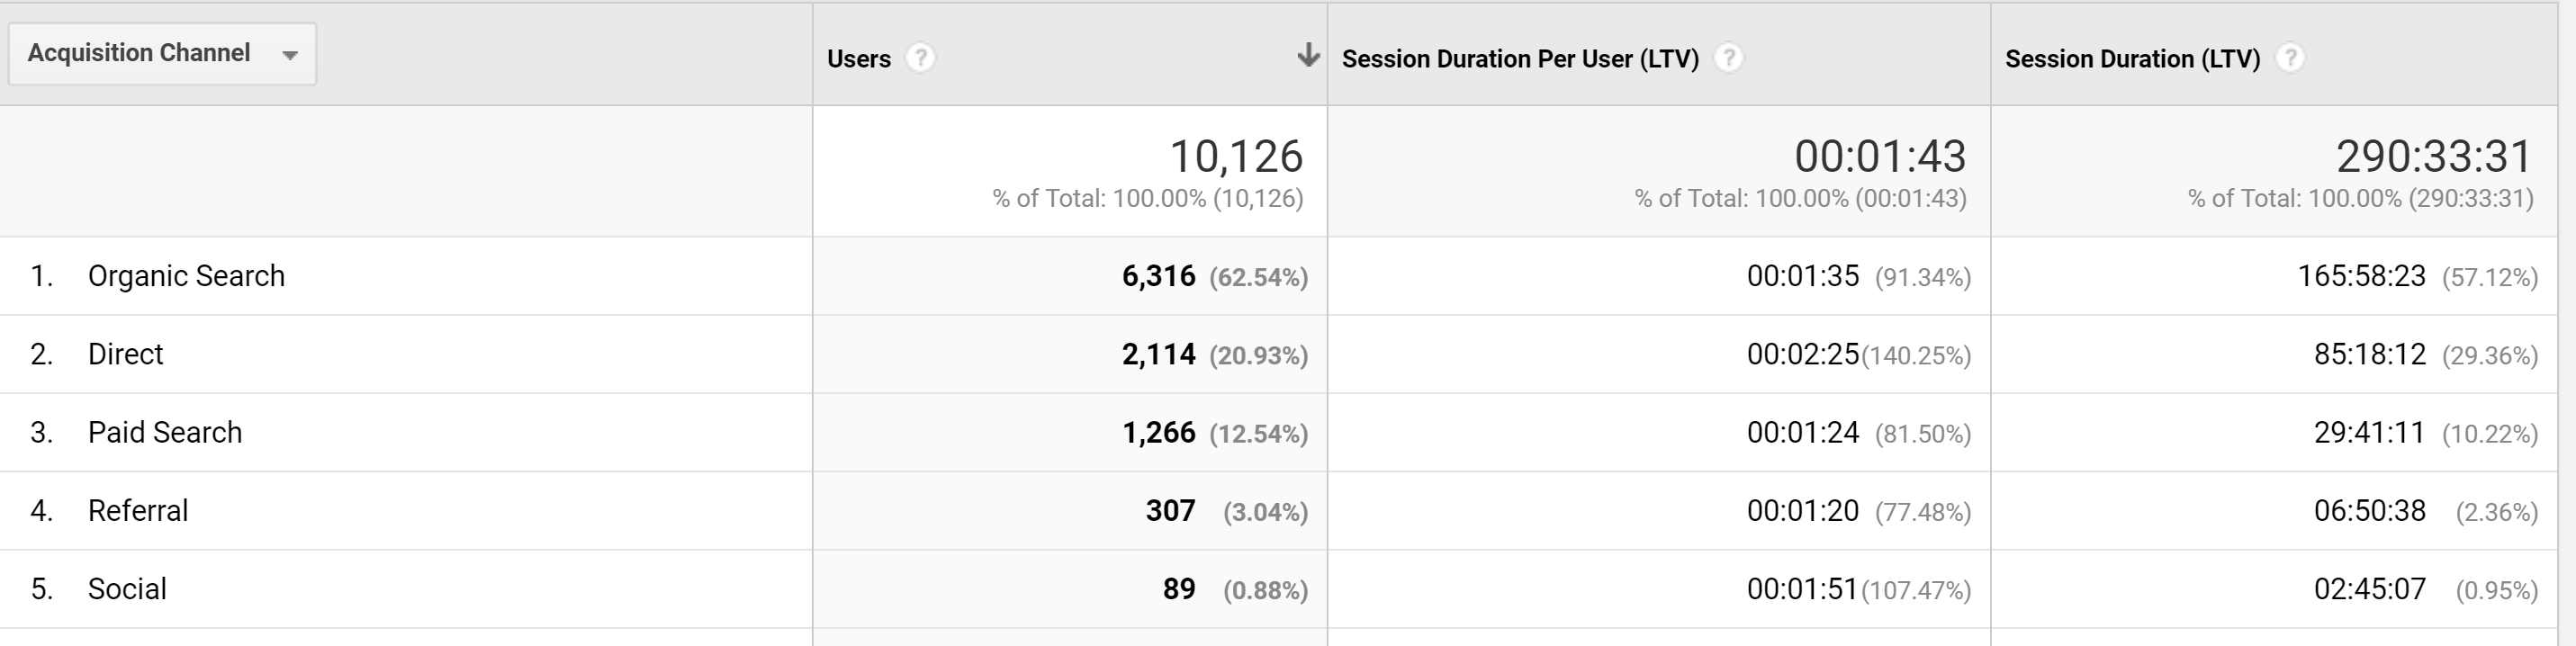 session duration lifetime value report